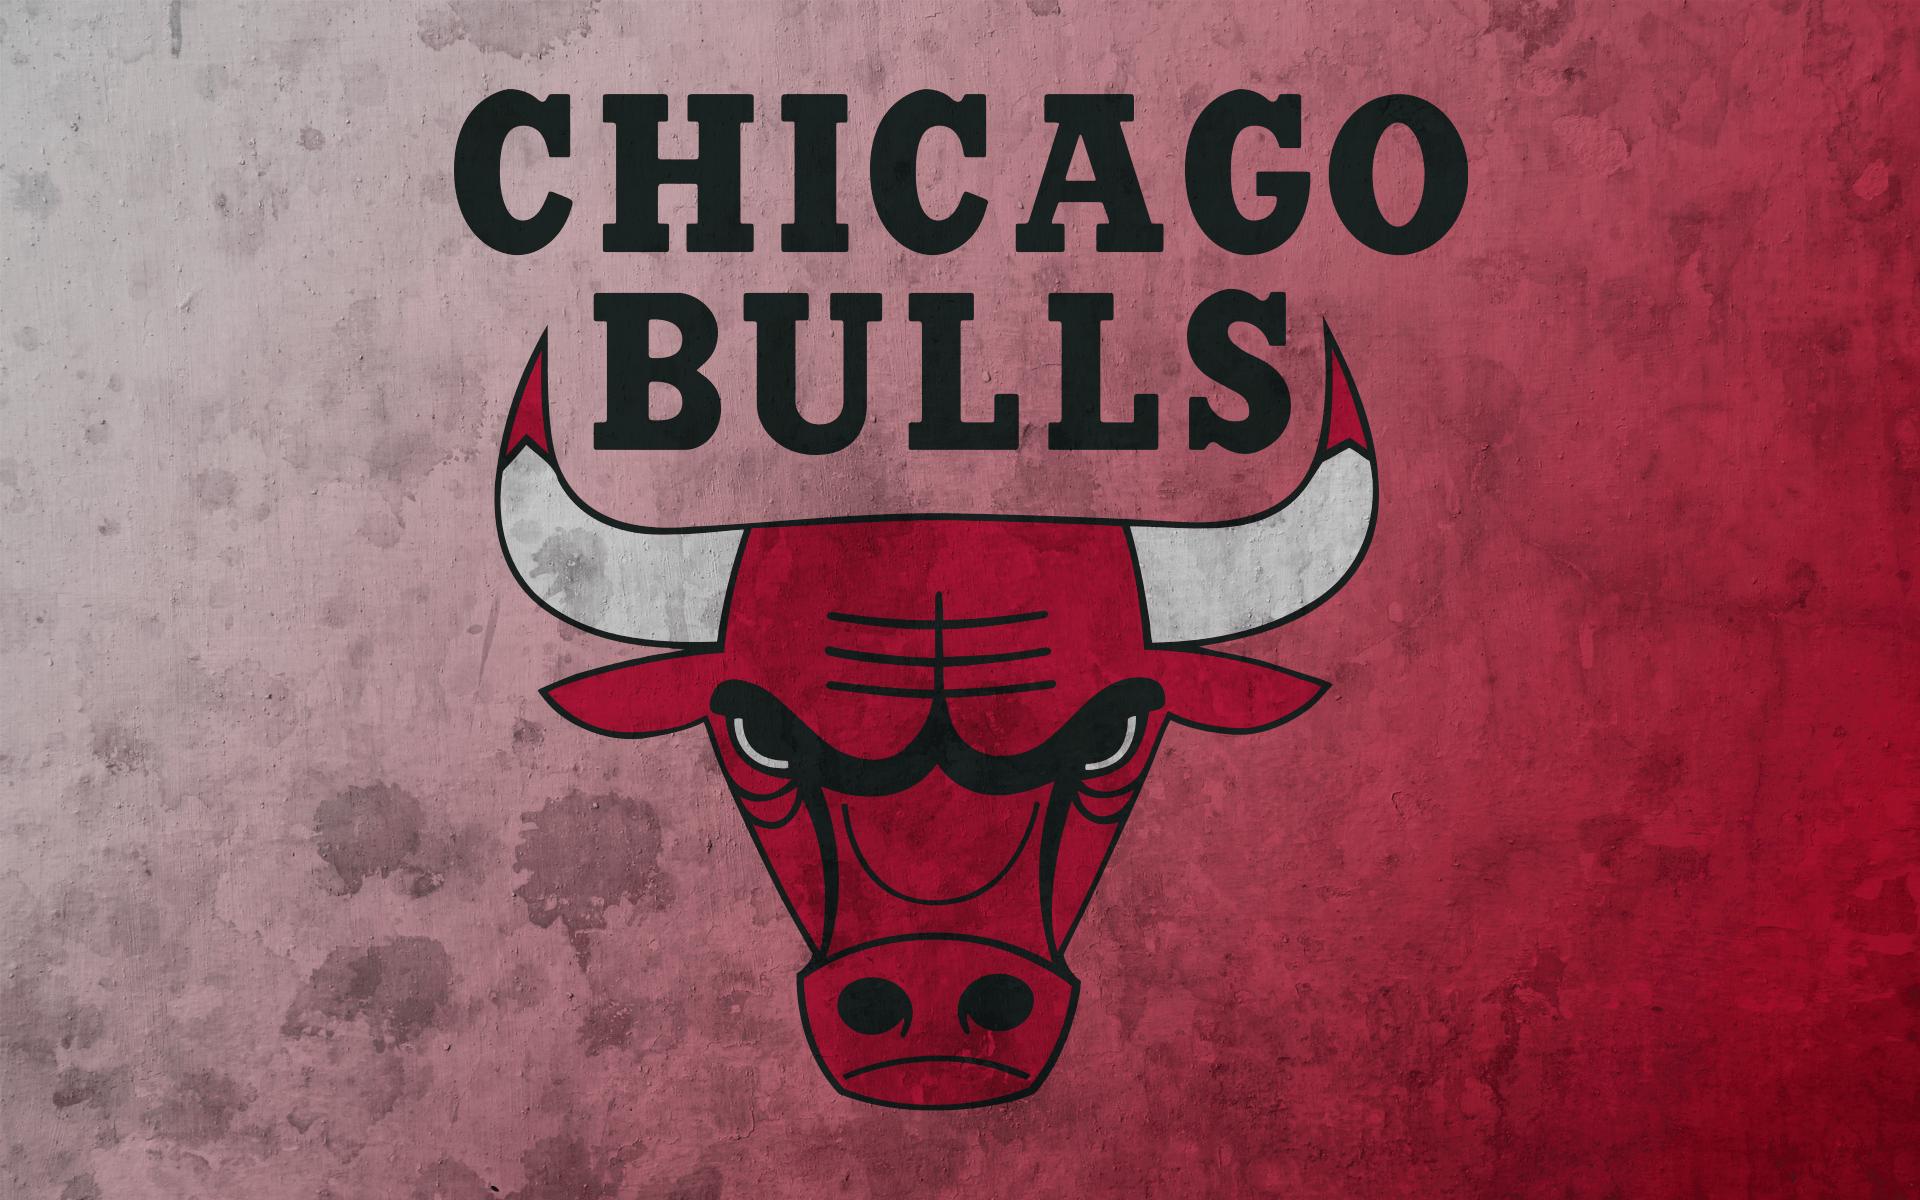 Chicago Bulls Wallpapers HD 2016 1920x1200